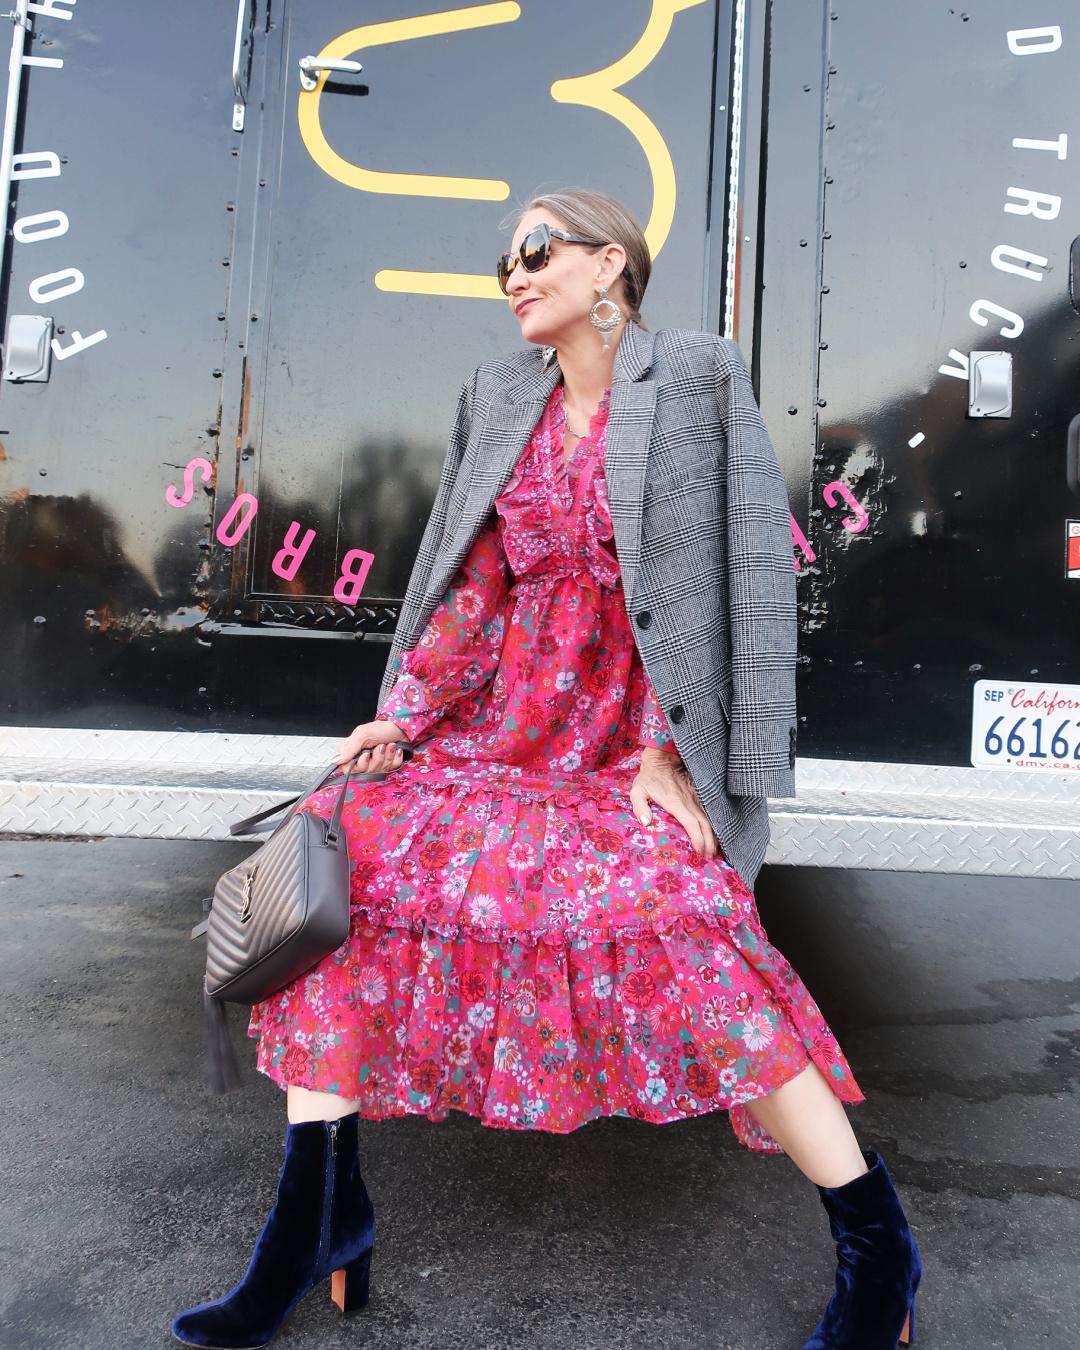 Caroline Vazzana Crosby Street Dress review